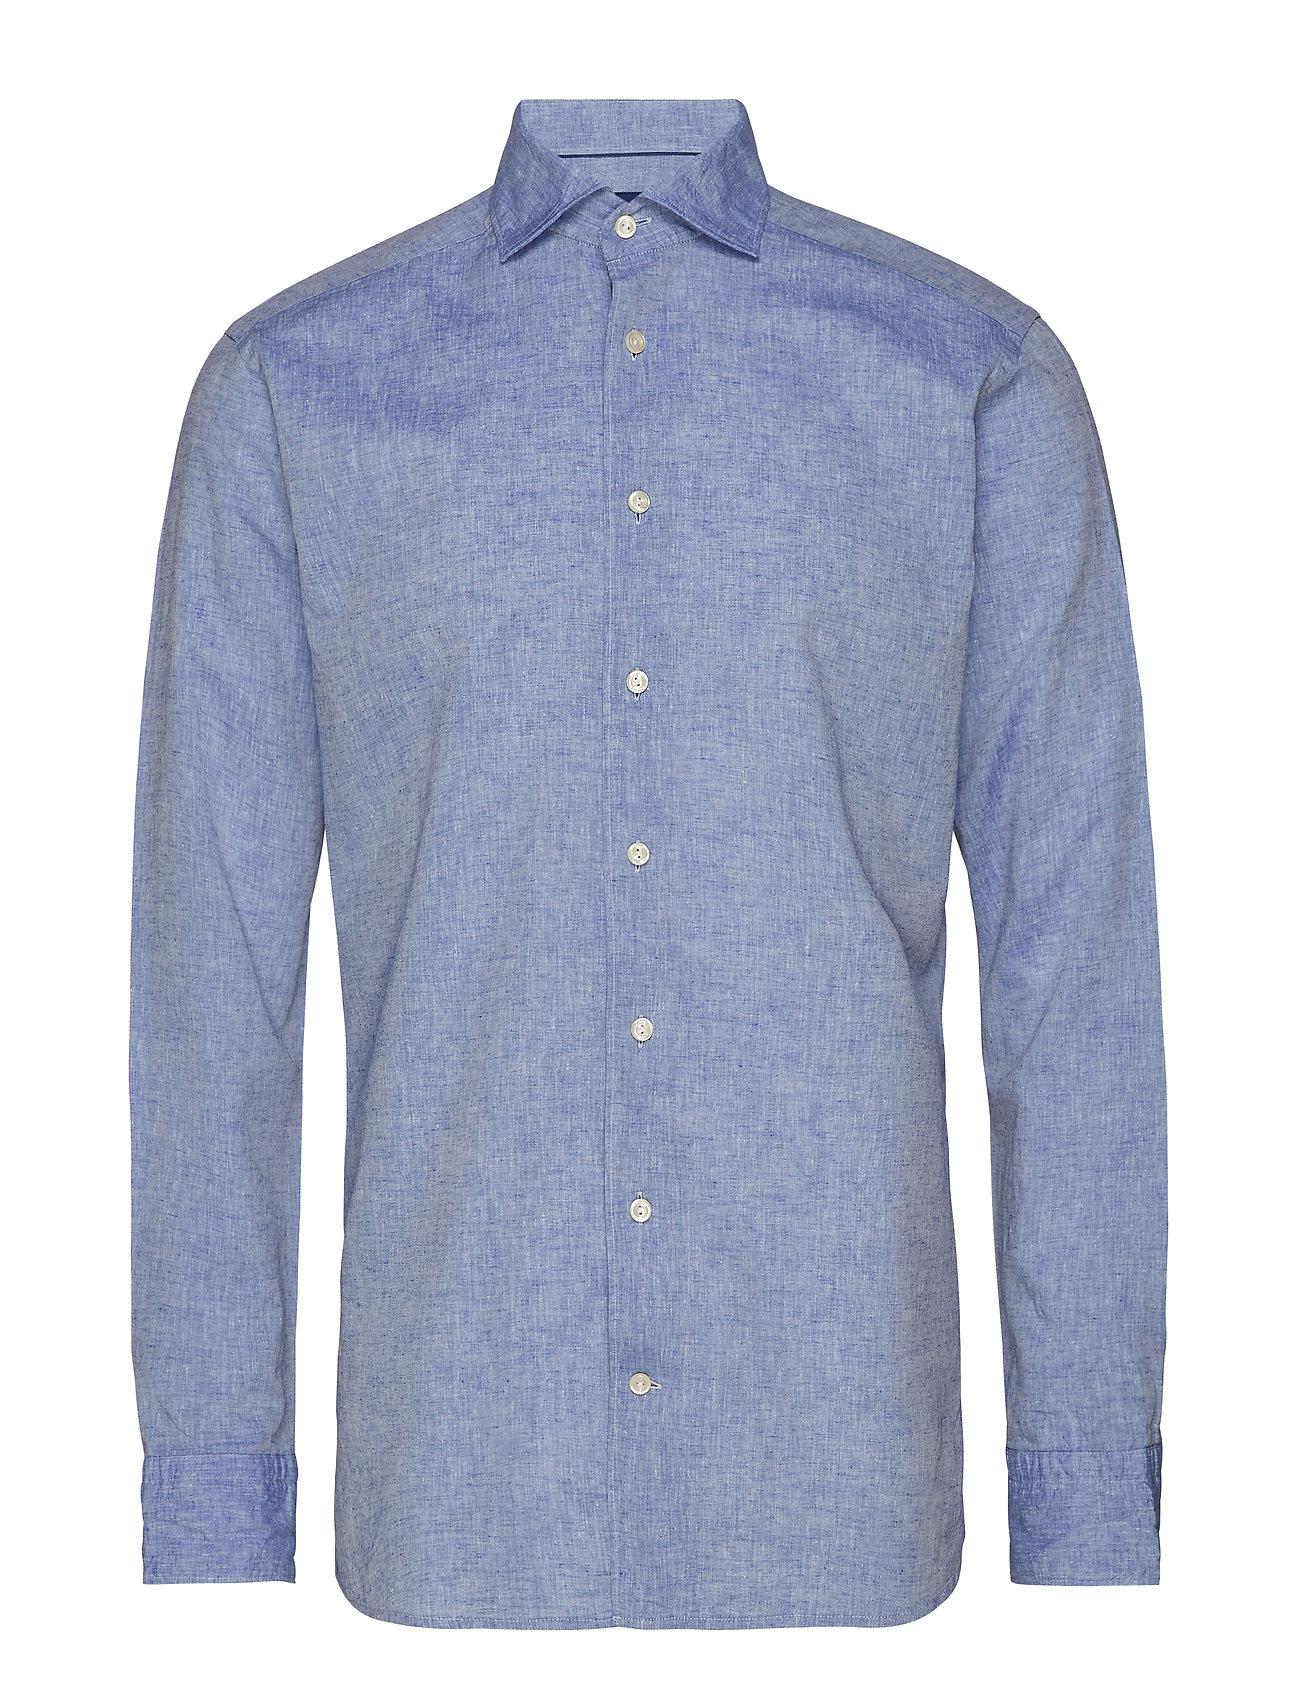 Eton White Cotton & Linen Shirt - BLUE